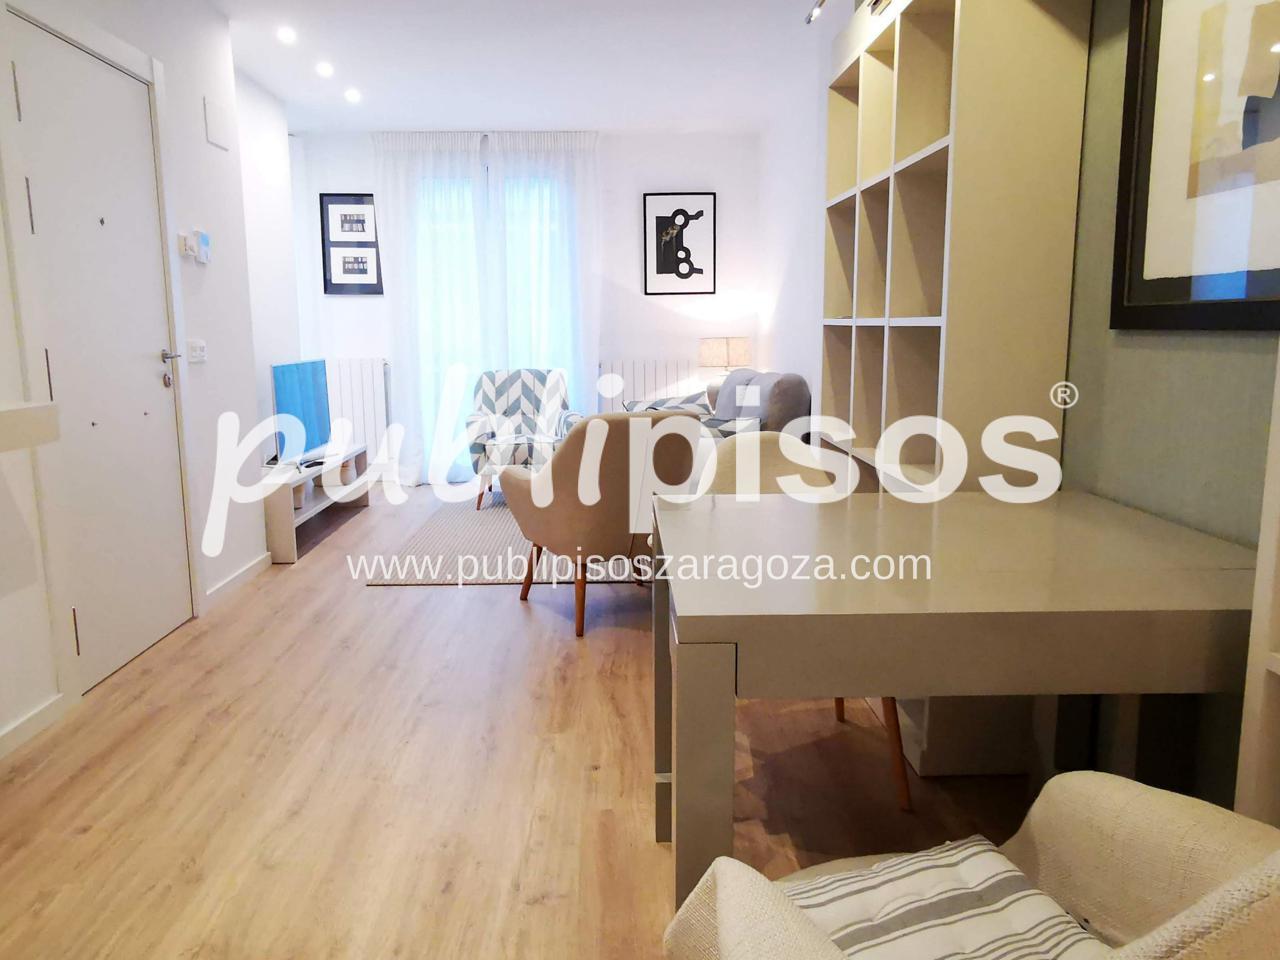 Piso obra nueva centro Zaragoza-4